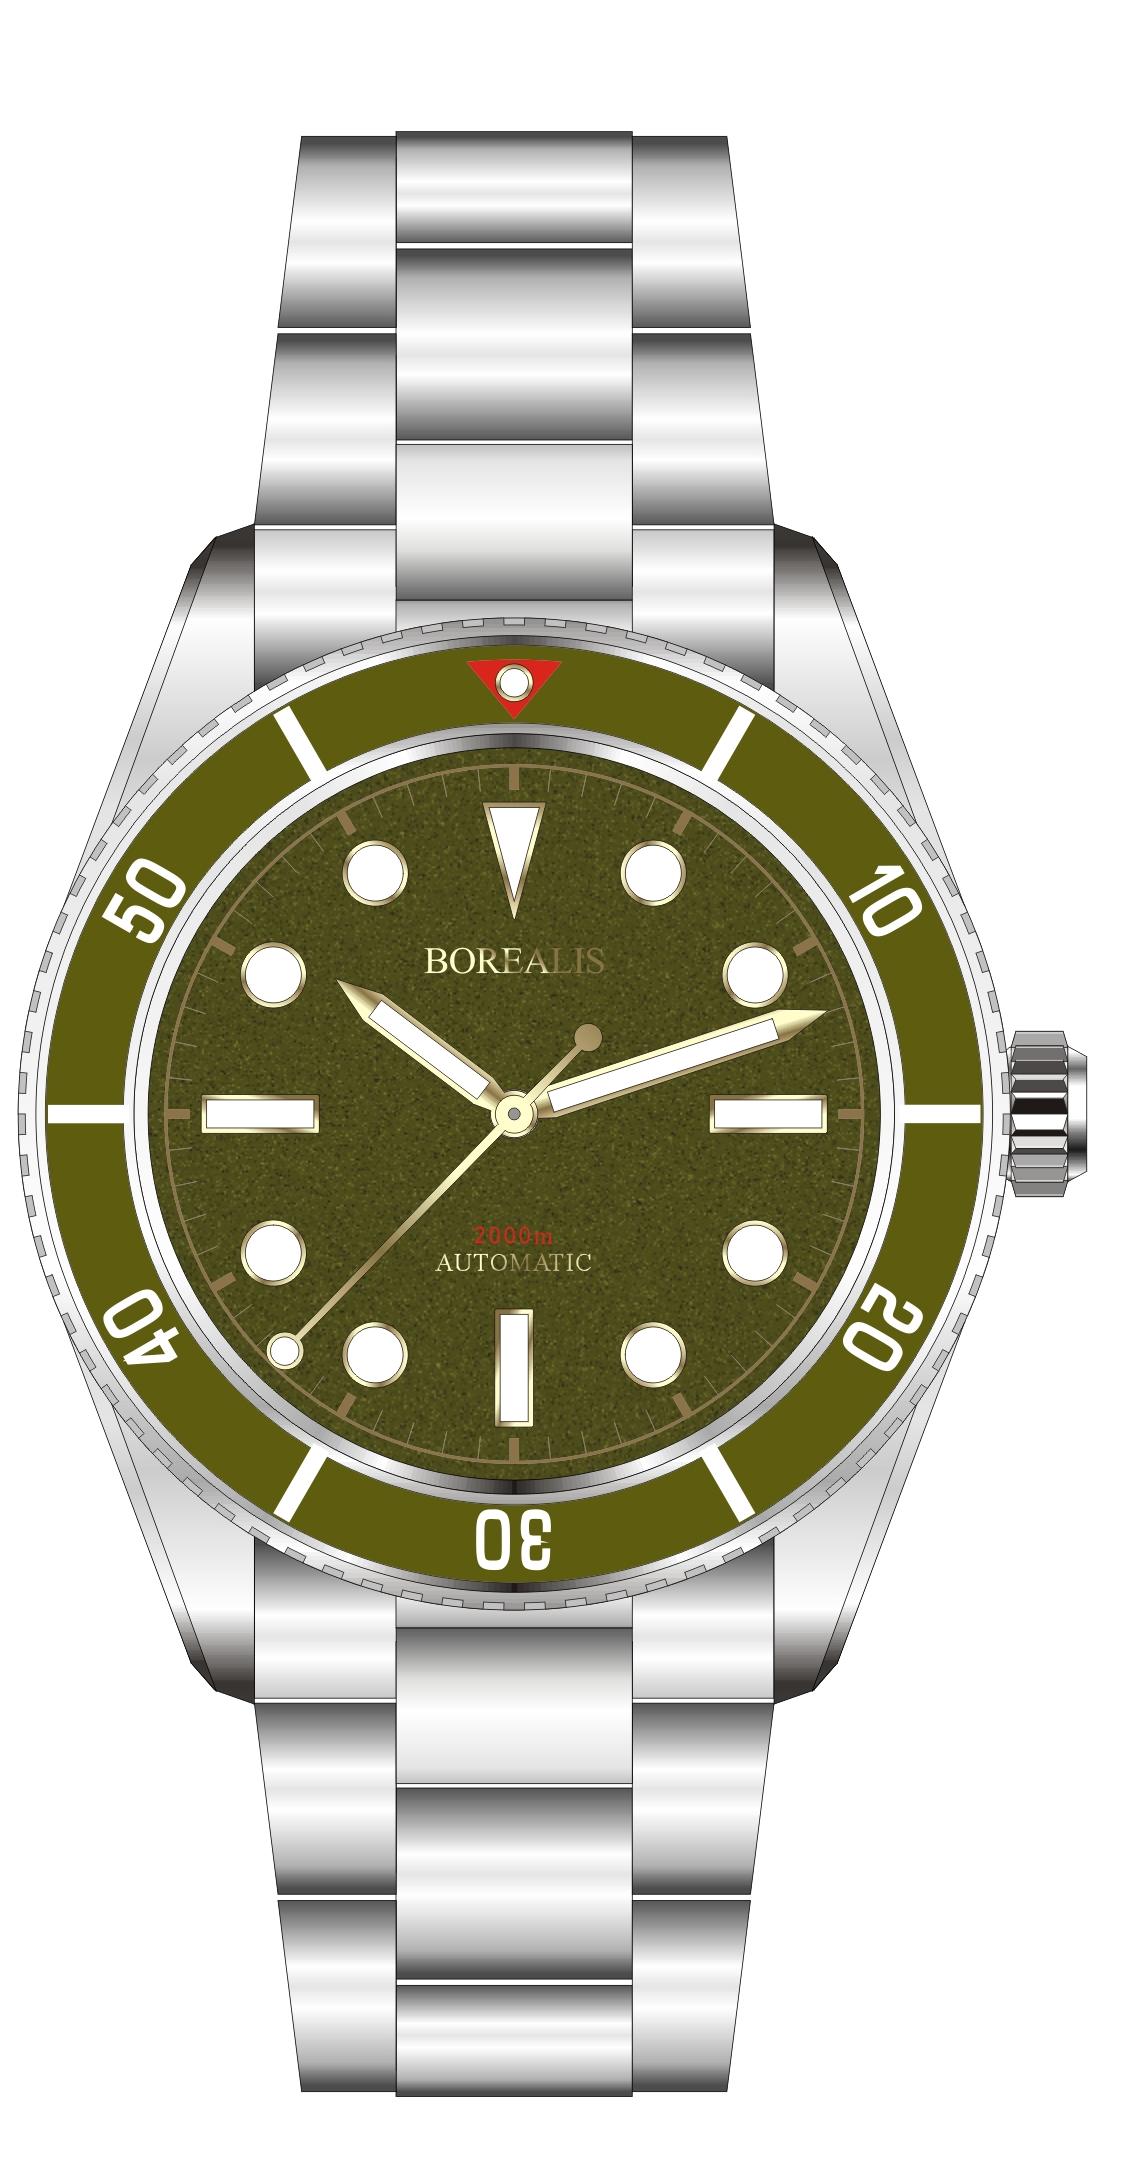 Borealis Bull Shark Automatic Diver Watch No Date Miyota 9015 Ceramic Green Bezel Green Dial BBSGBGDND